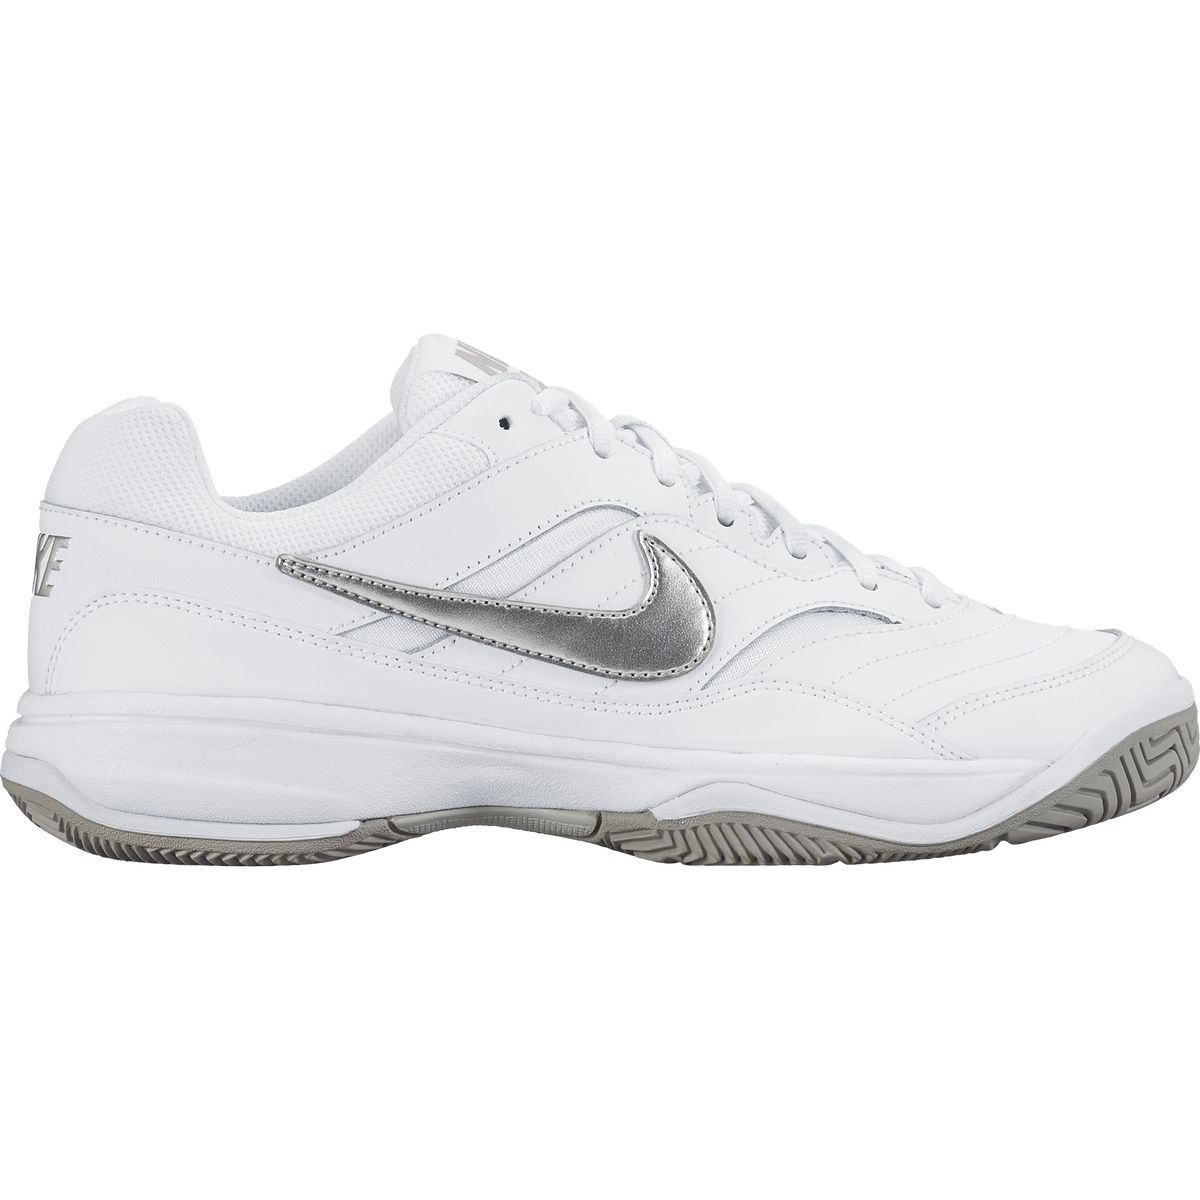 reputable site 05505 42c03 Nike Court Lite Women s Tennis Shoe - White